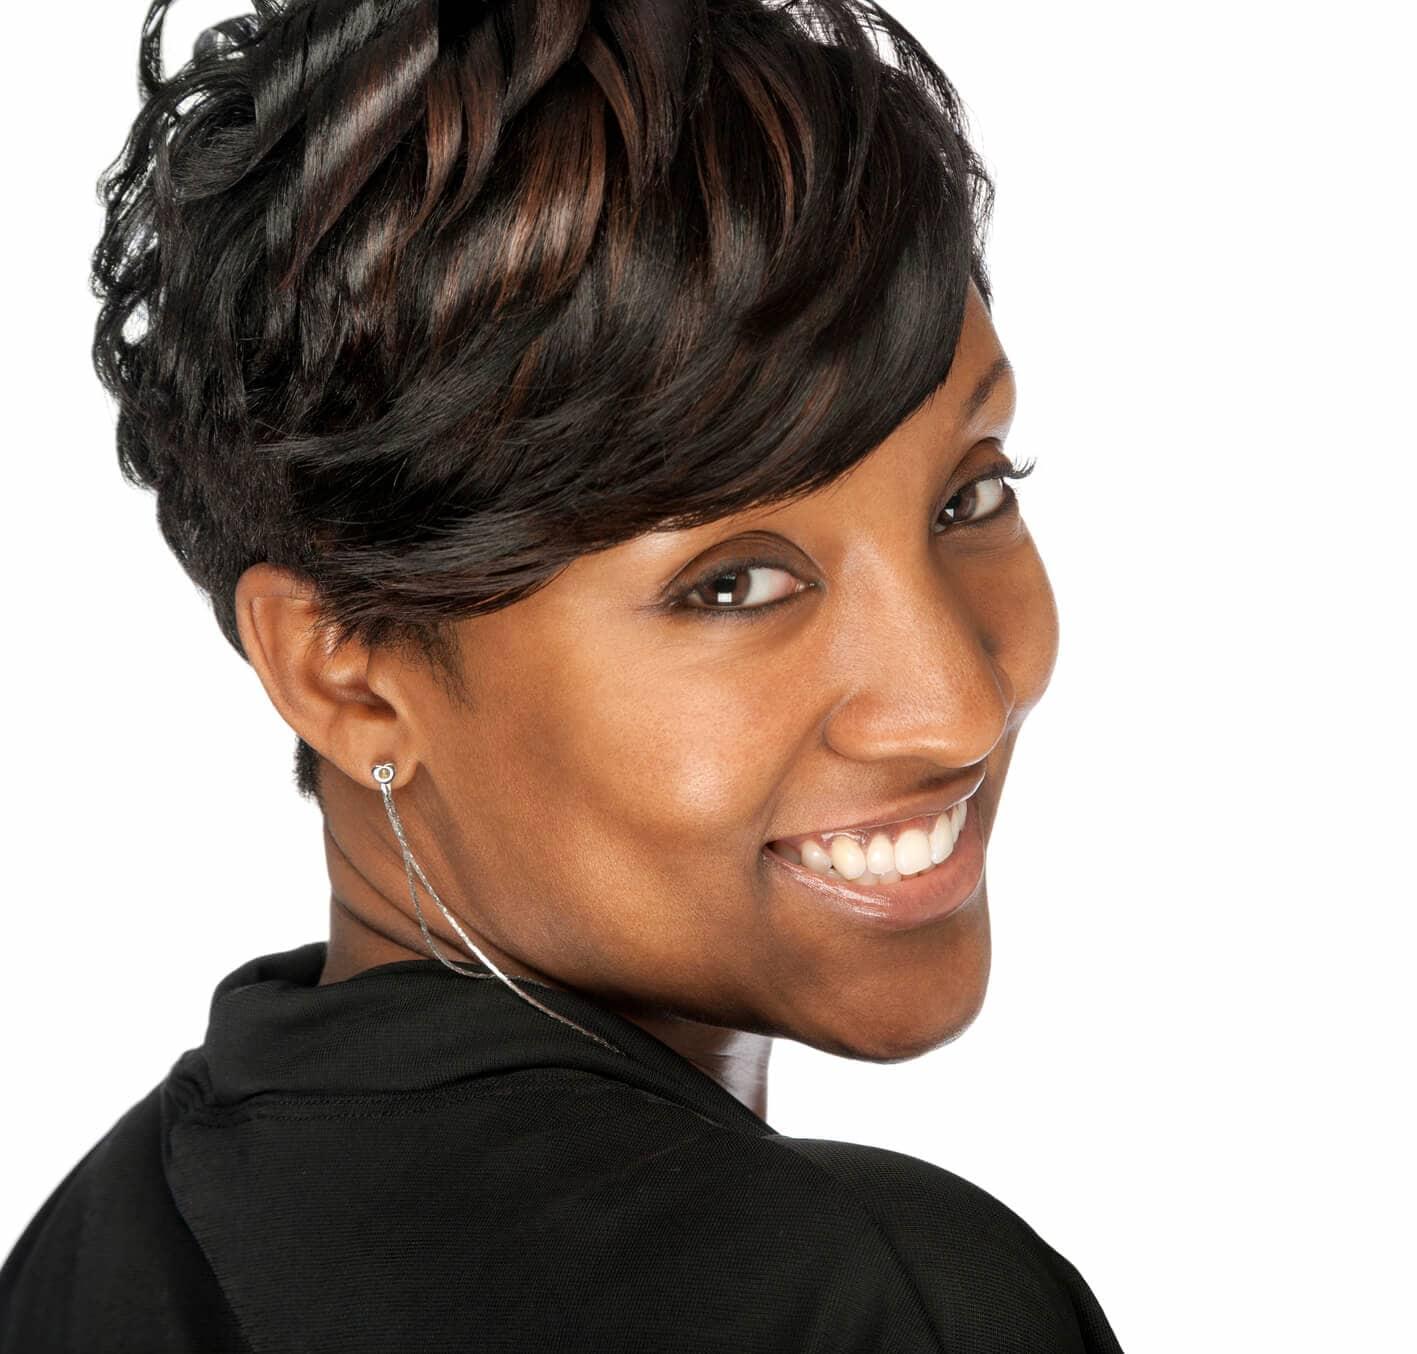 Easy Styles For Short Natural Hair Short Black Hair Ath Us